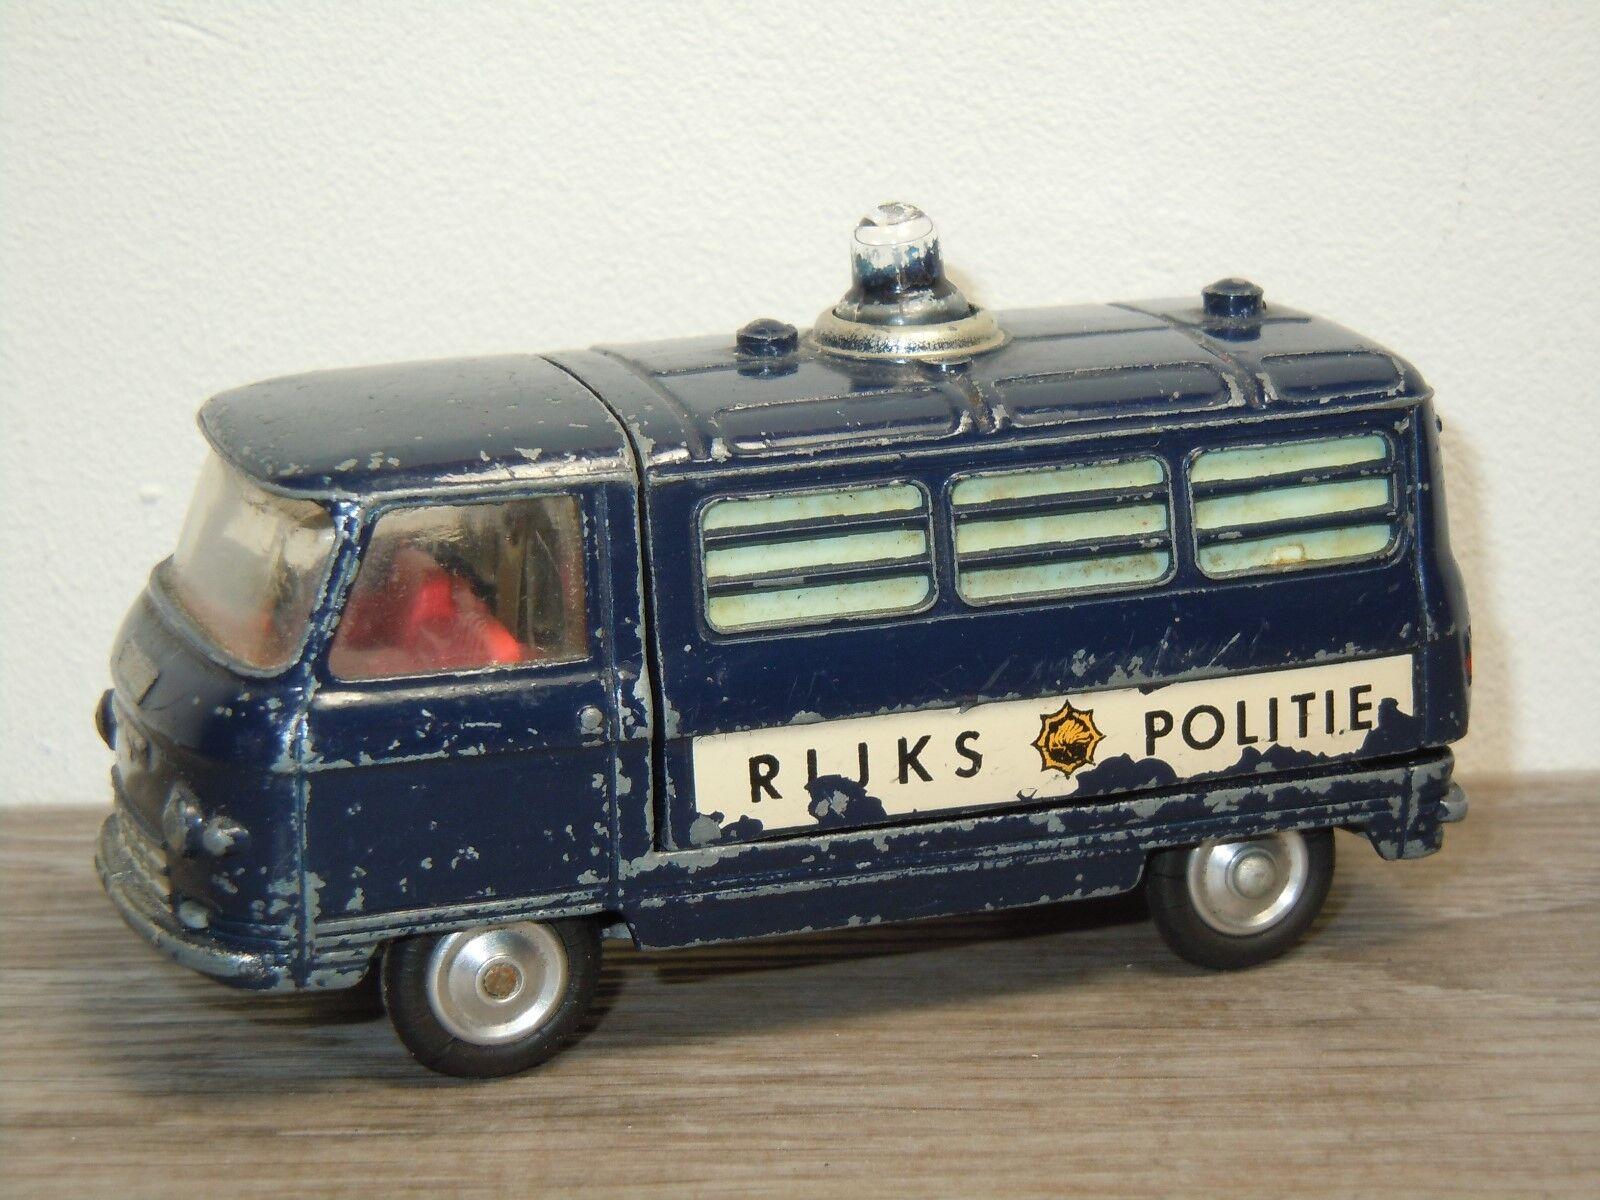 Commer RIJKSPOLITIE - Corgi Toys 464 England 32368